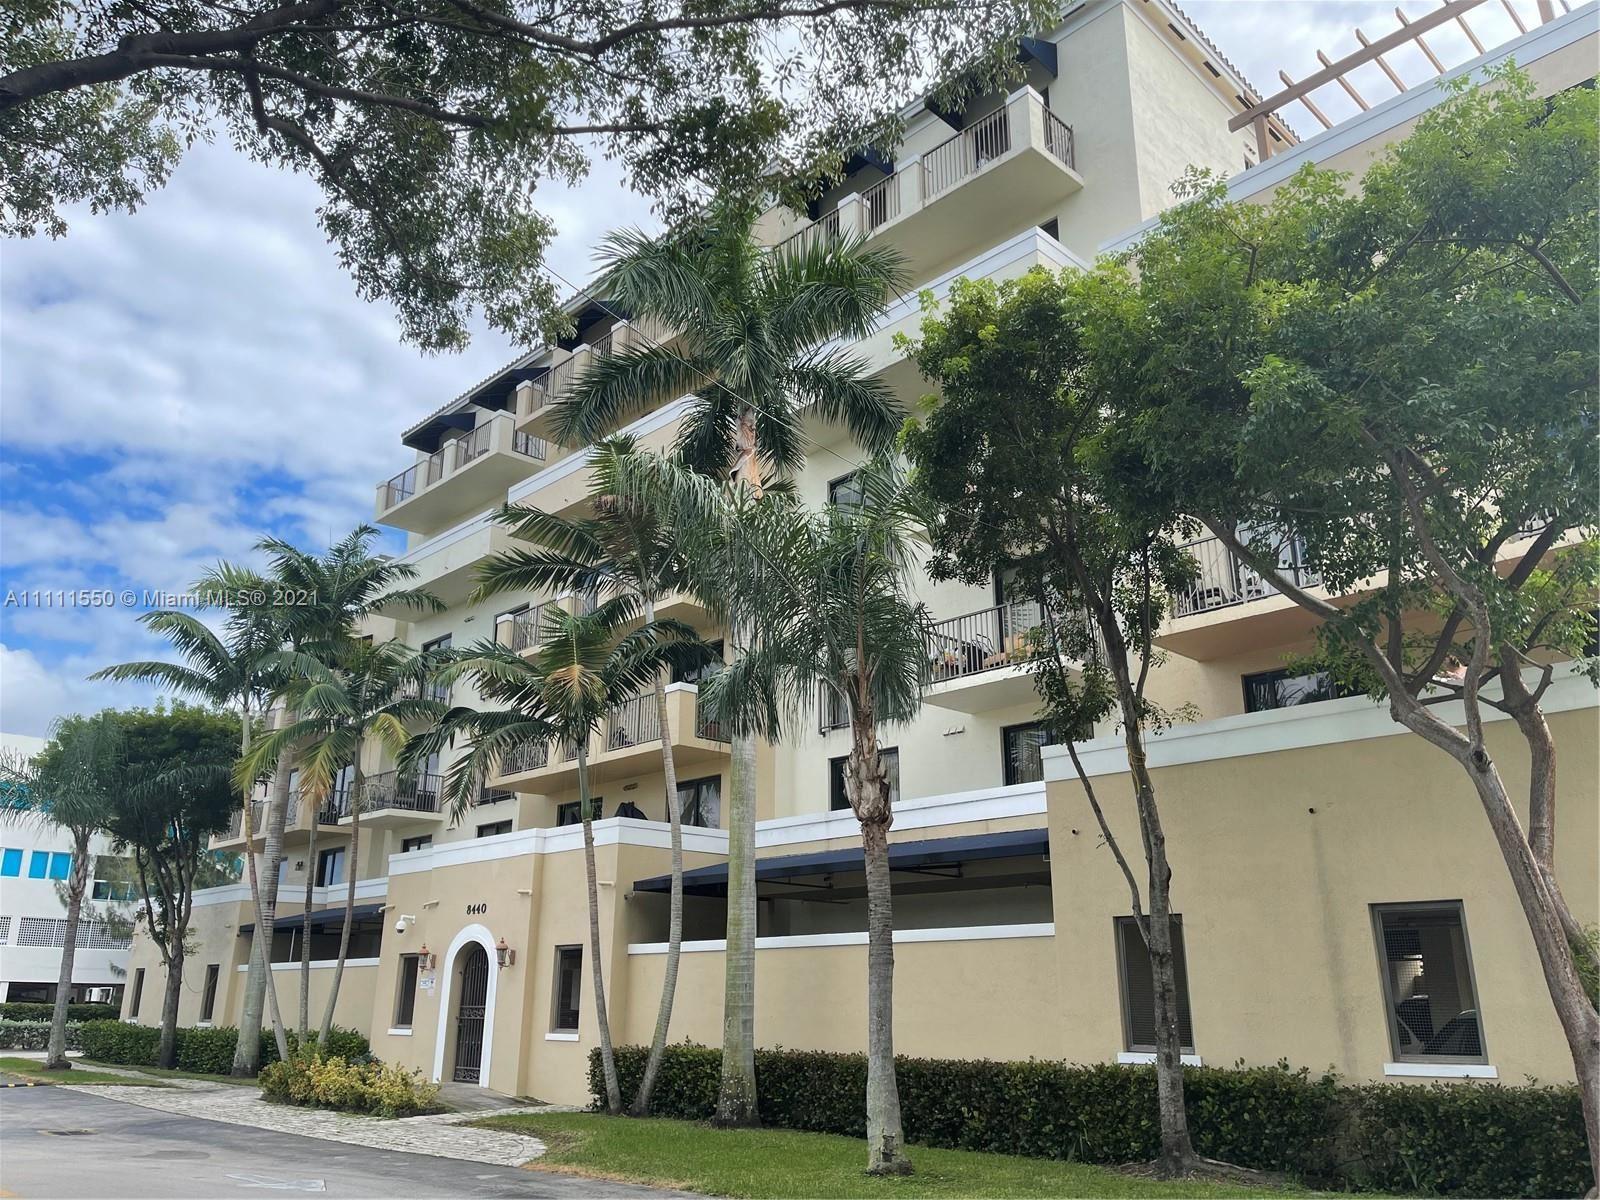 8430 SW 8th St #401B, Miami, FL 33144 - #: A11111550